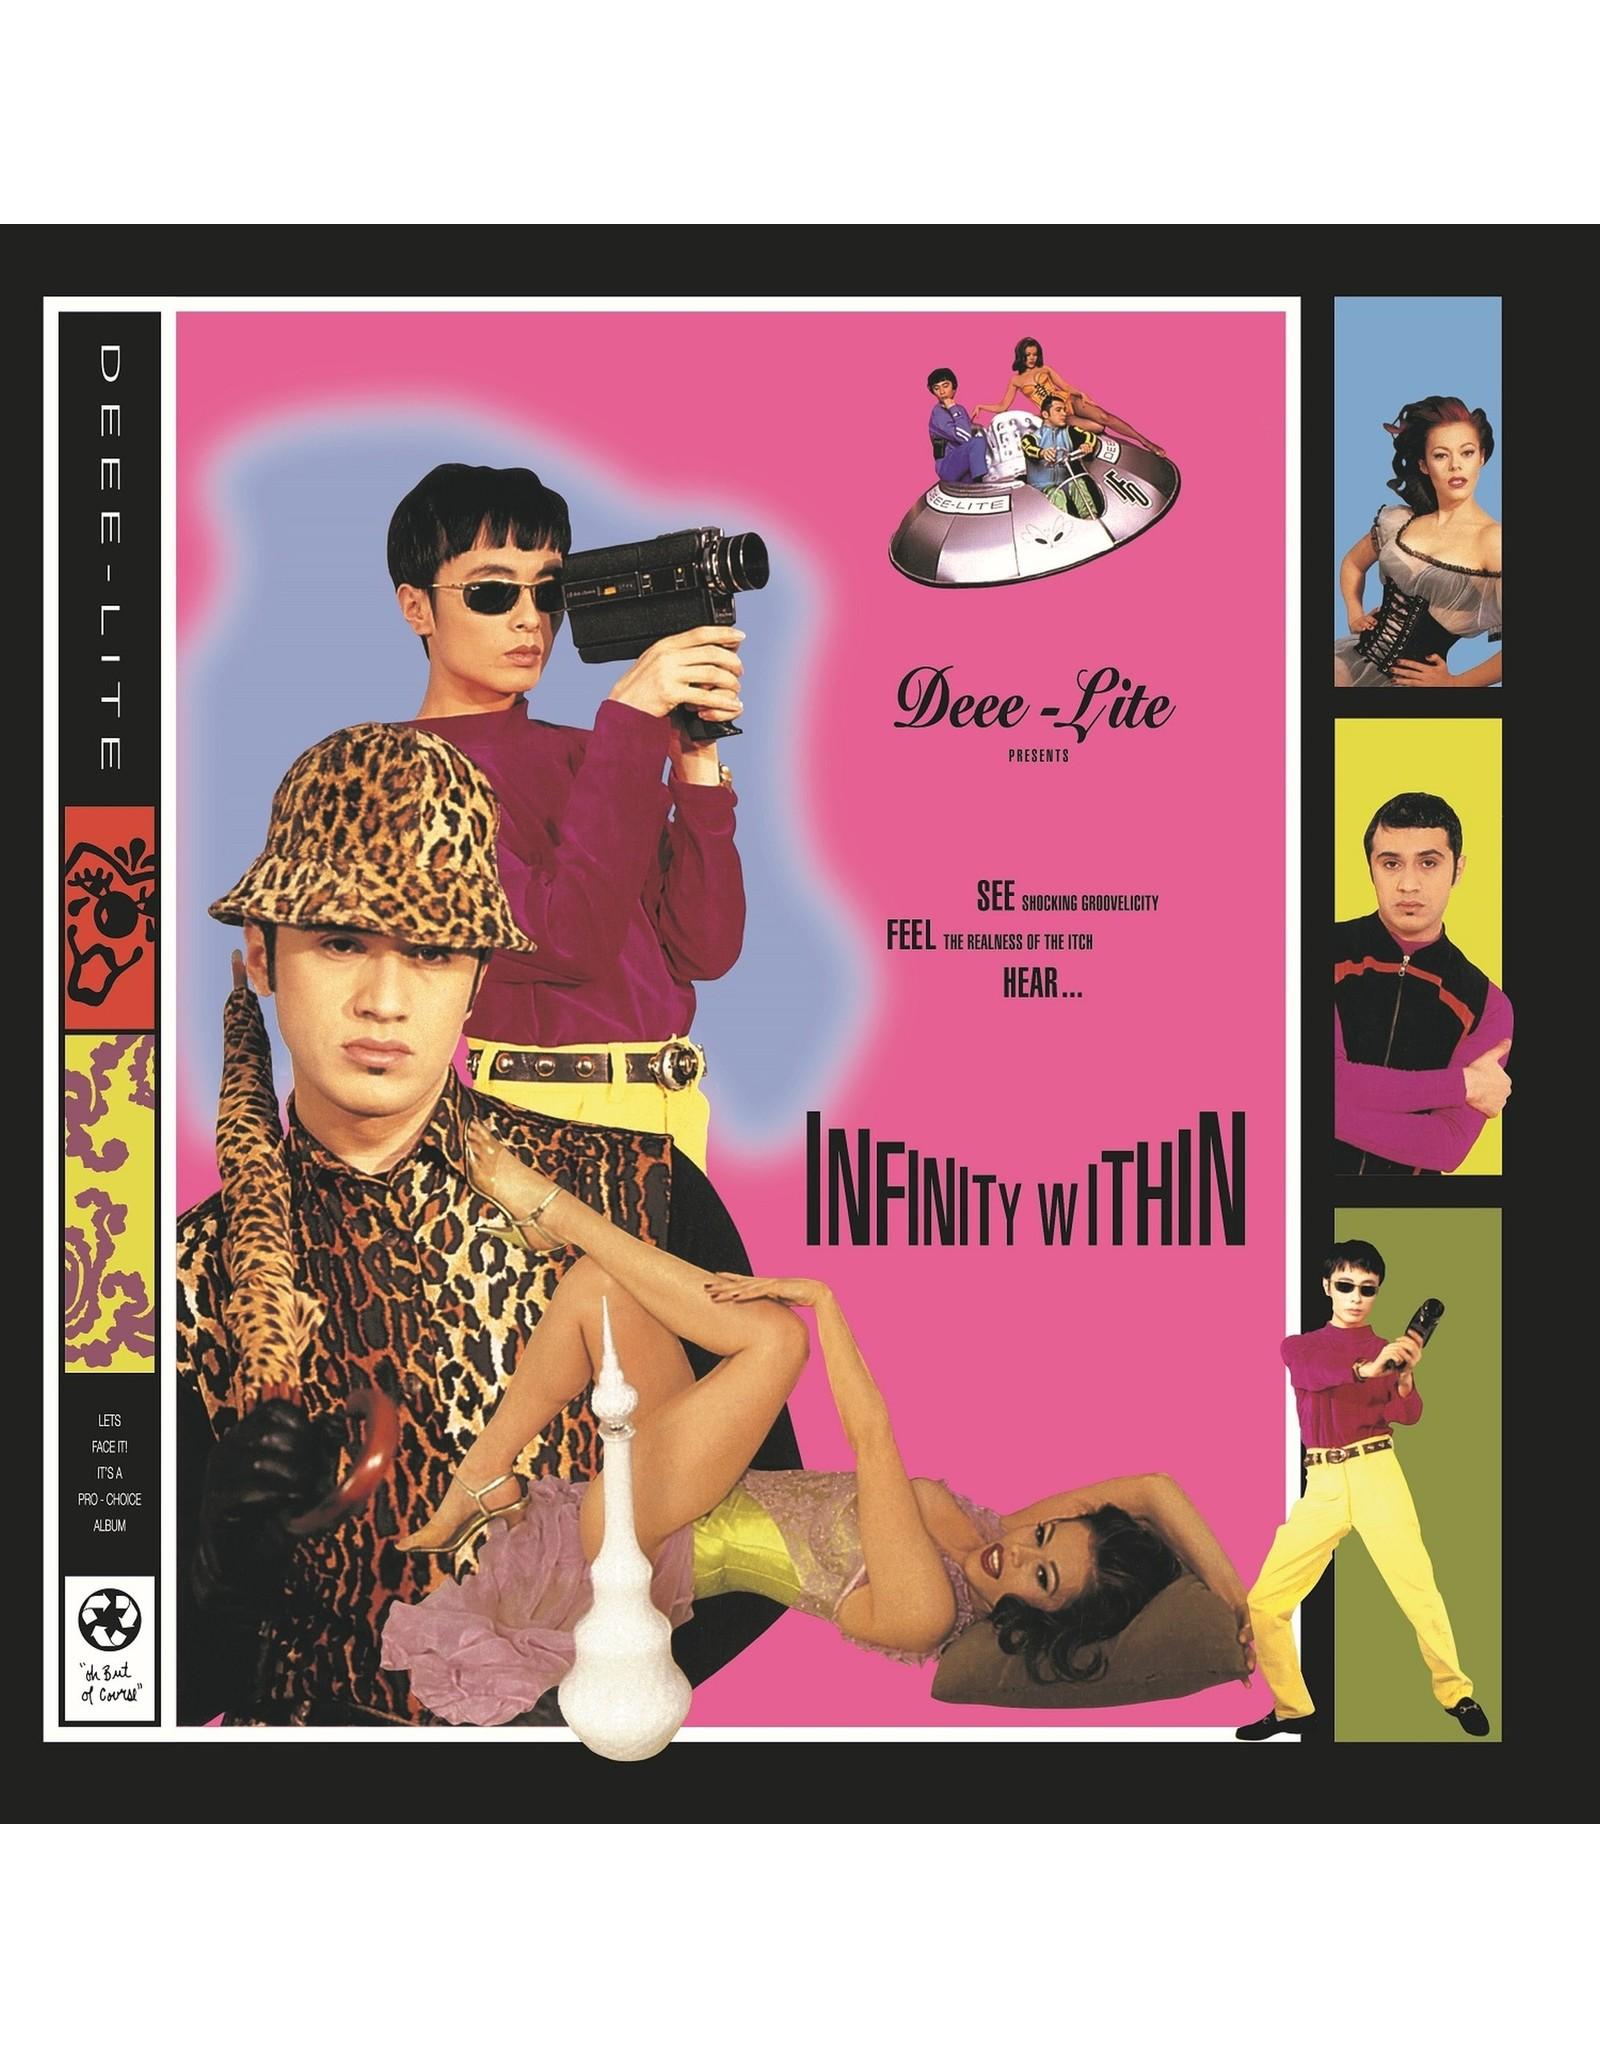 Deee-Lite - Infinity Within